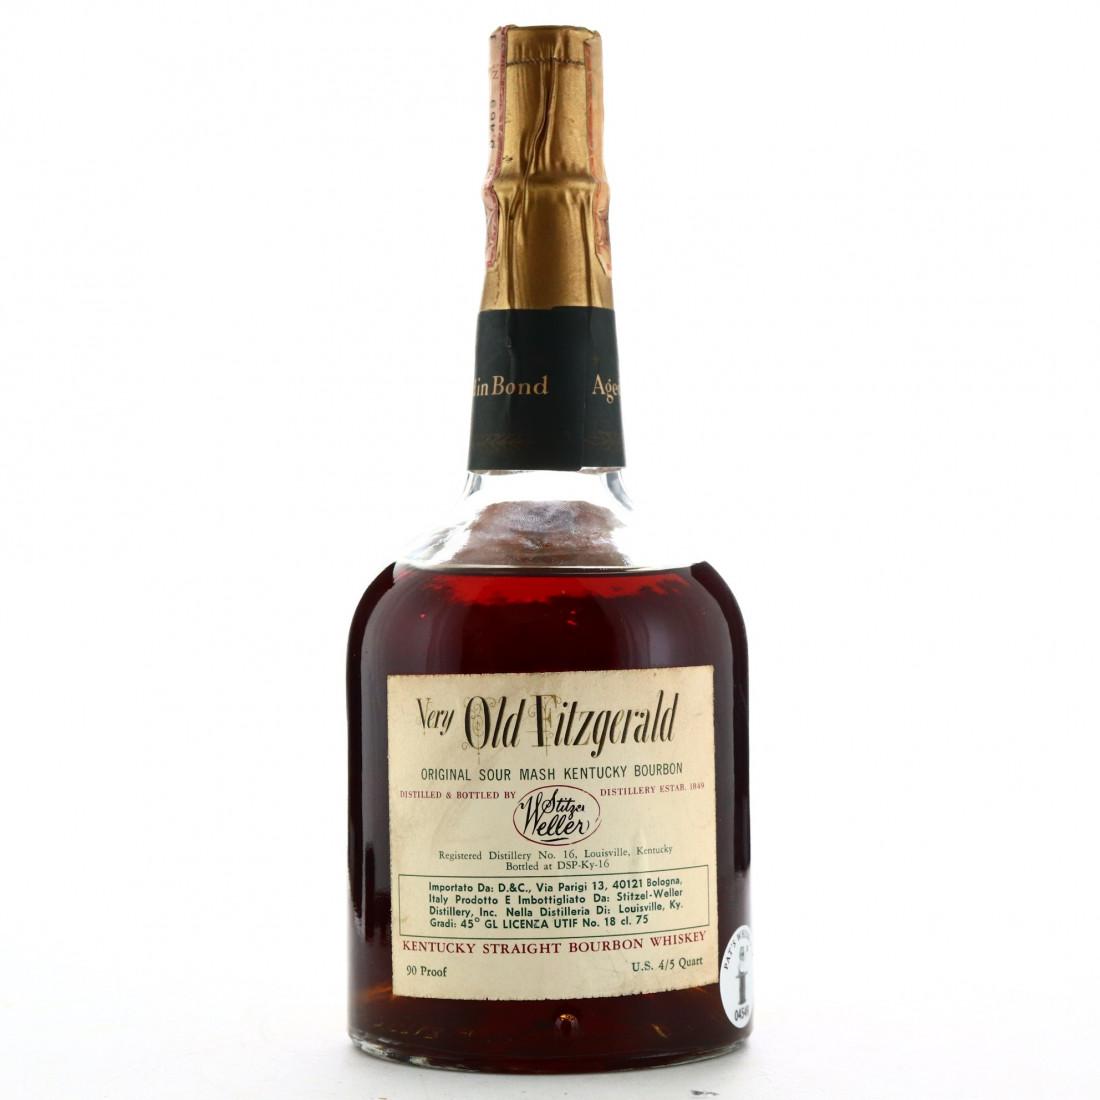 Very Old Fitzgerald 1963 Bottled in Bond 8 Year Old 90 Proof / Stitzel-Weller